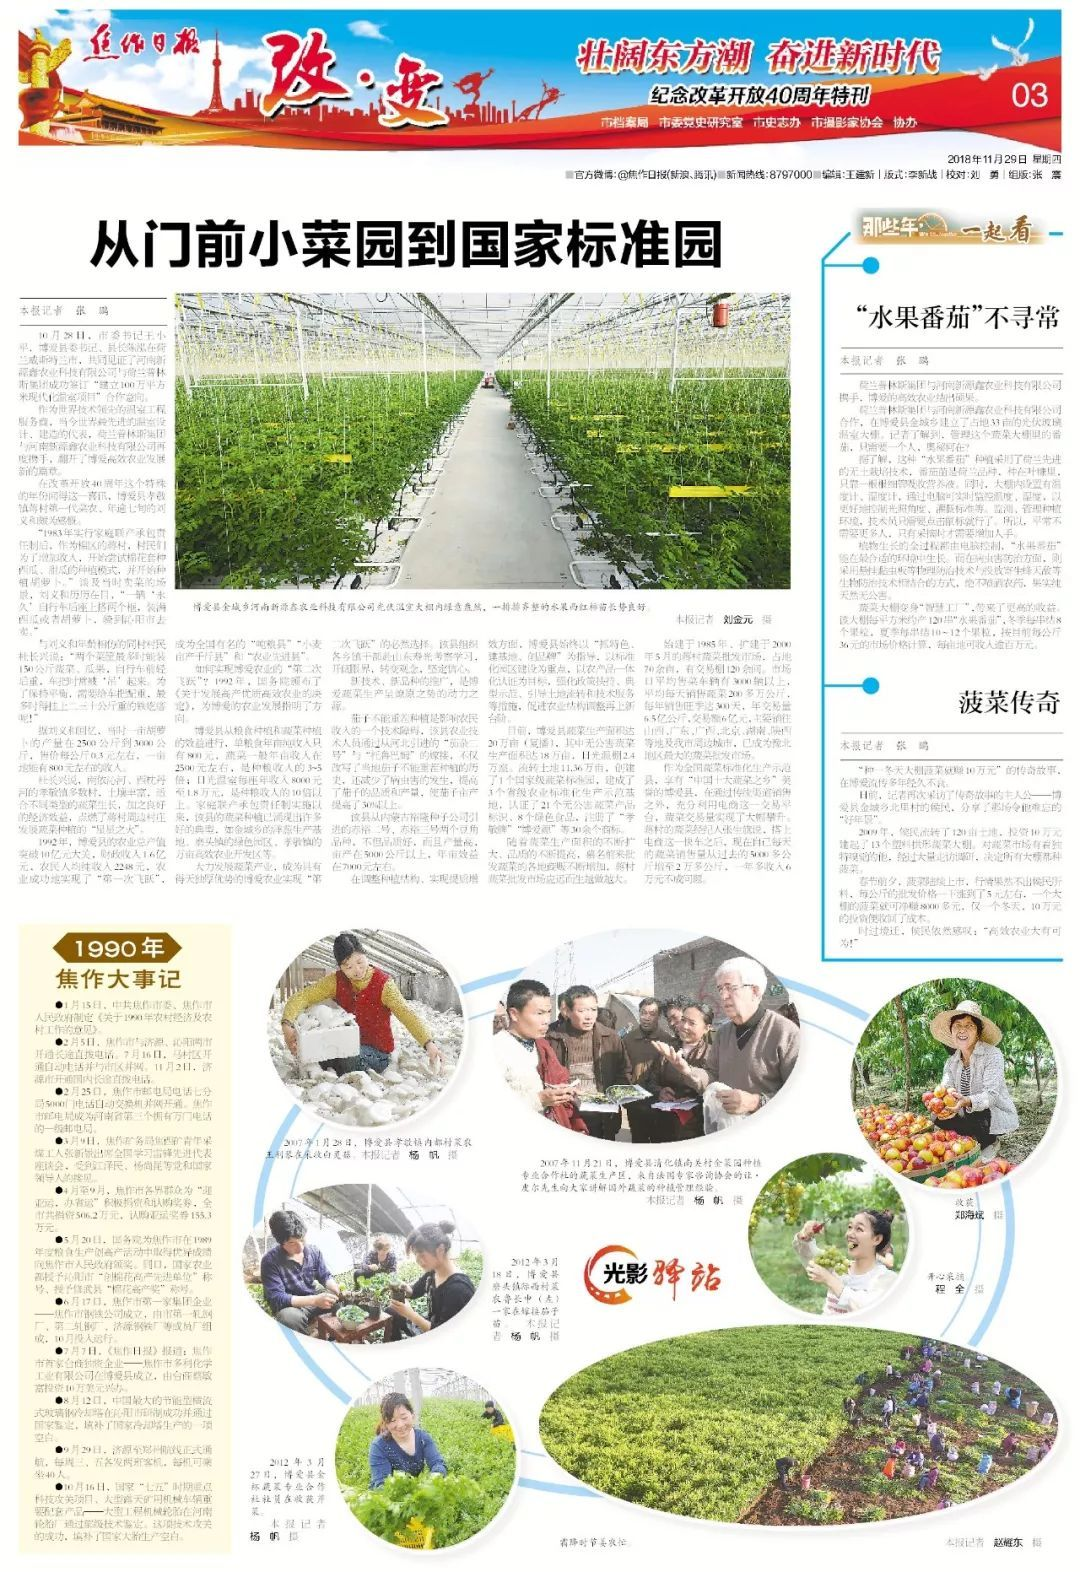 http://www.wzxmy.com/wenhuayichan/15674.html